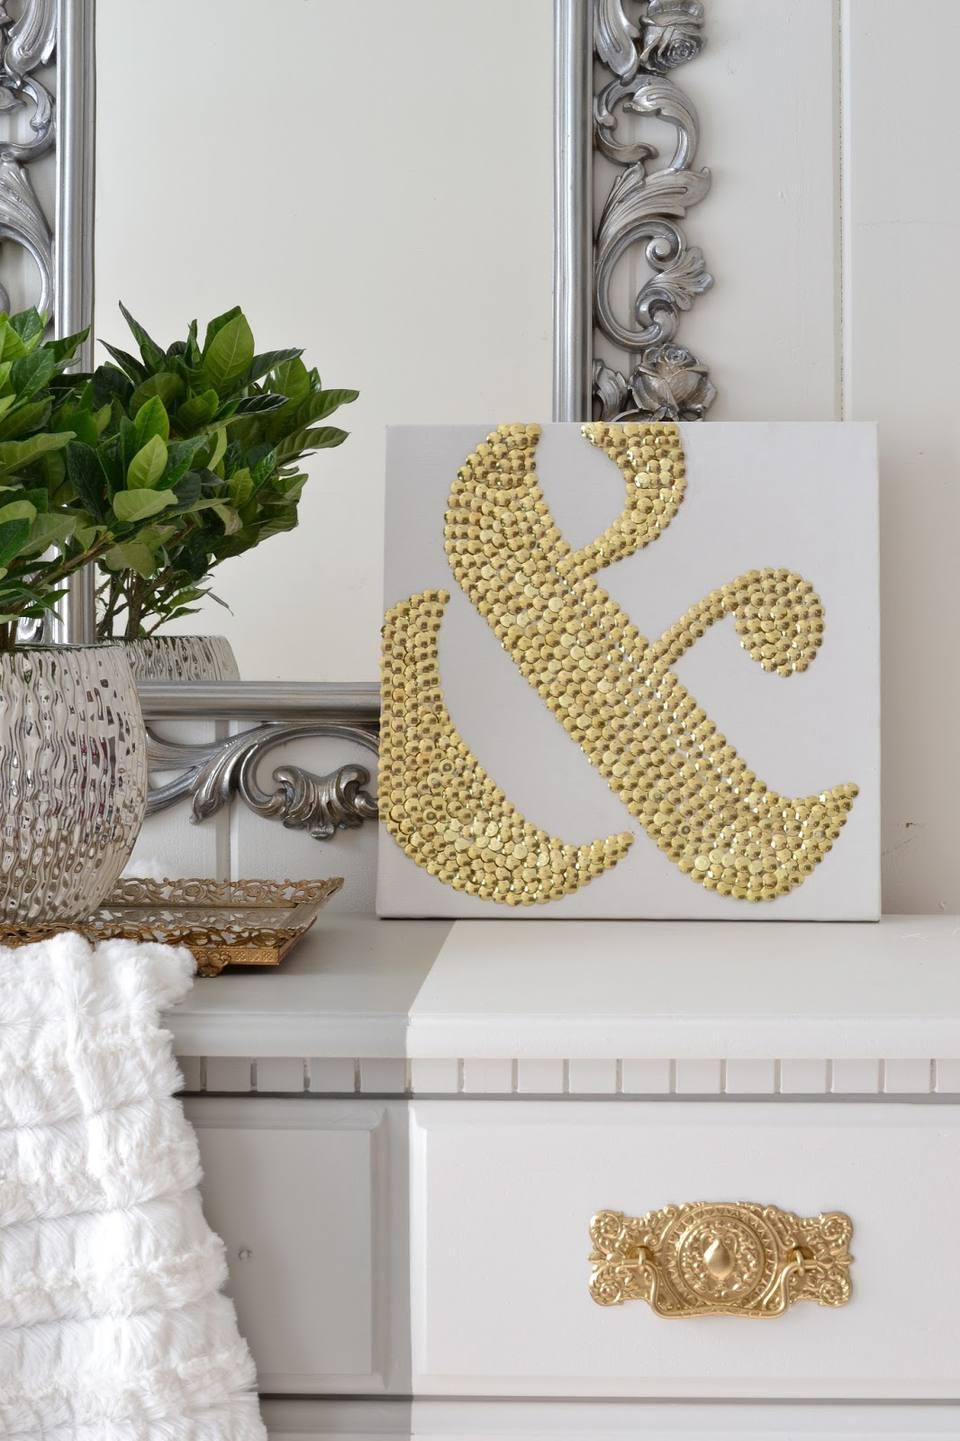 25 Thrifty Dollar Store Craft Ideas